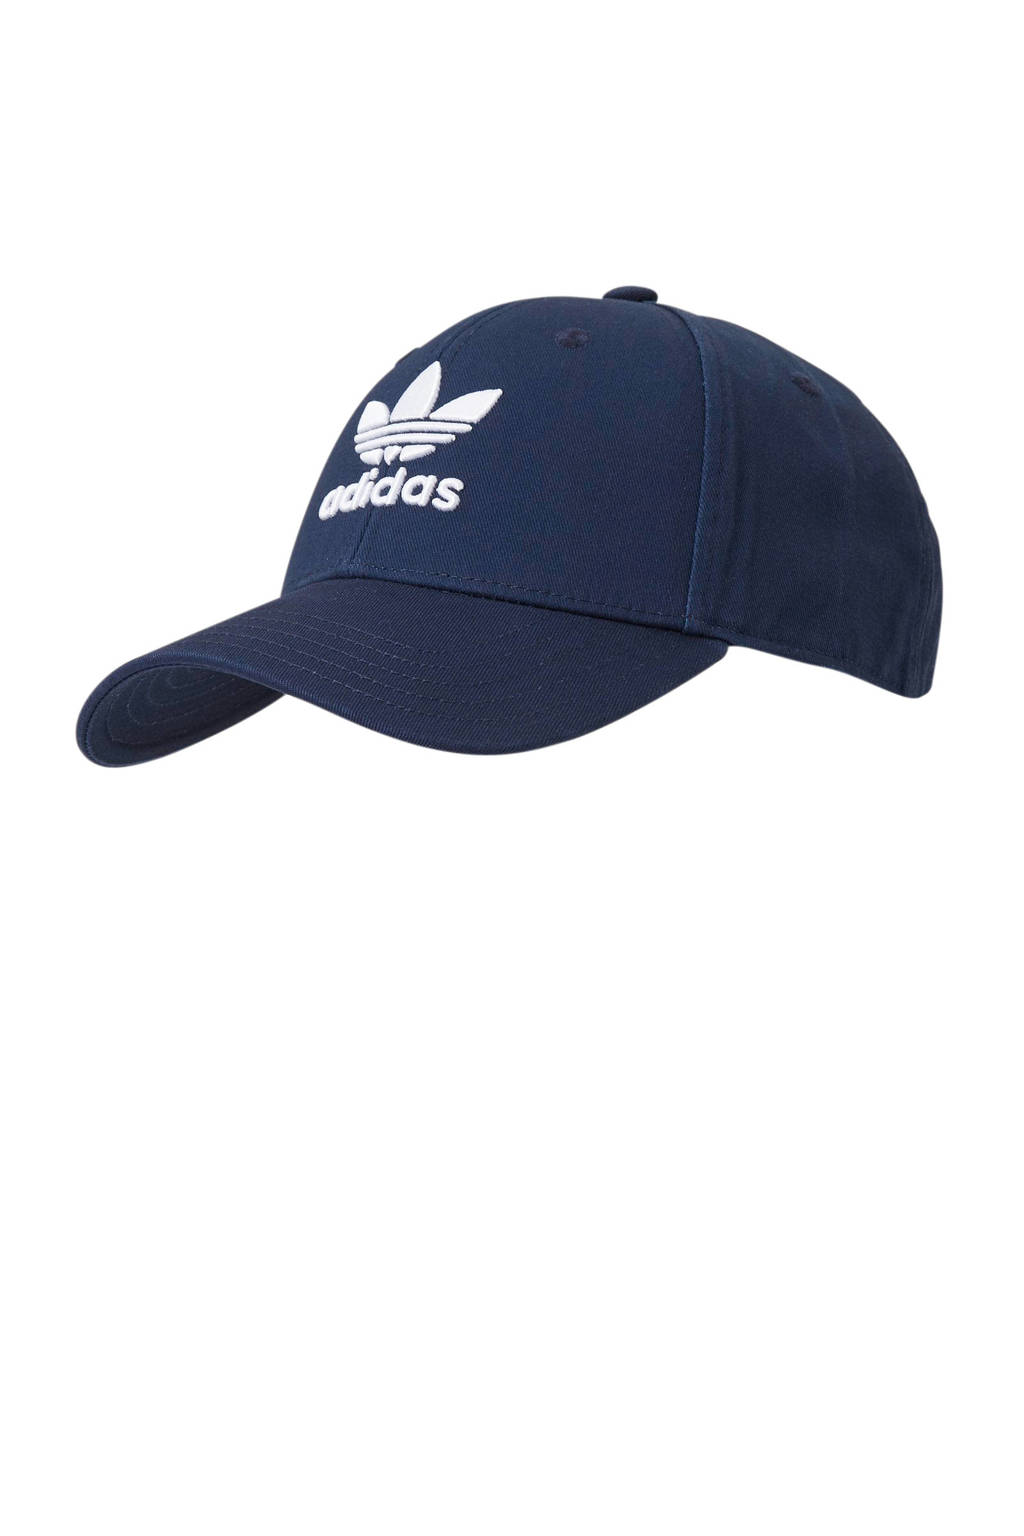 adidas Originals Adicolor baseball pet donkerrood, Donkerblauw